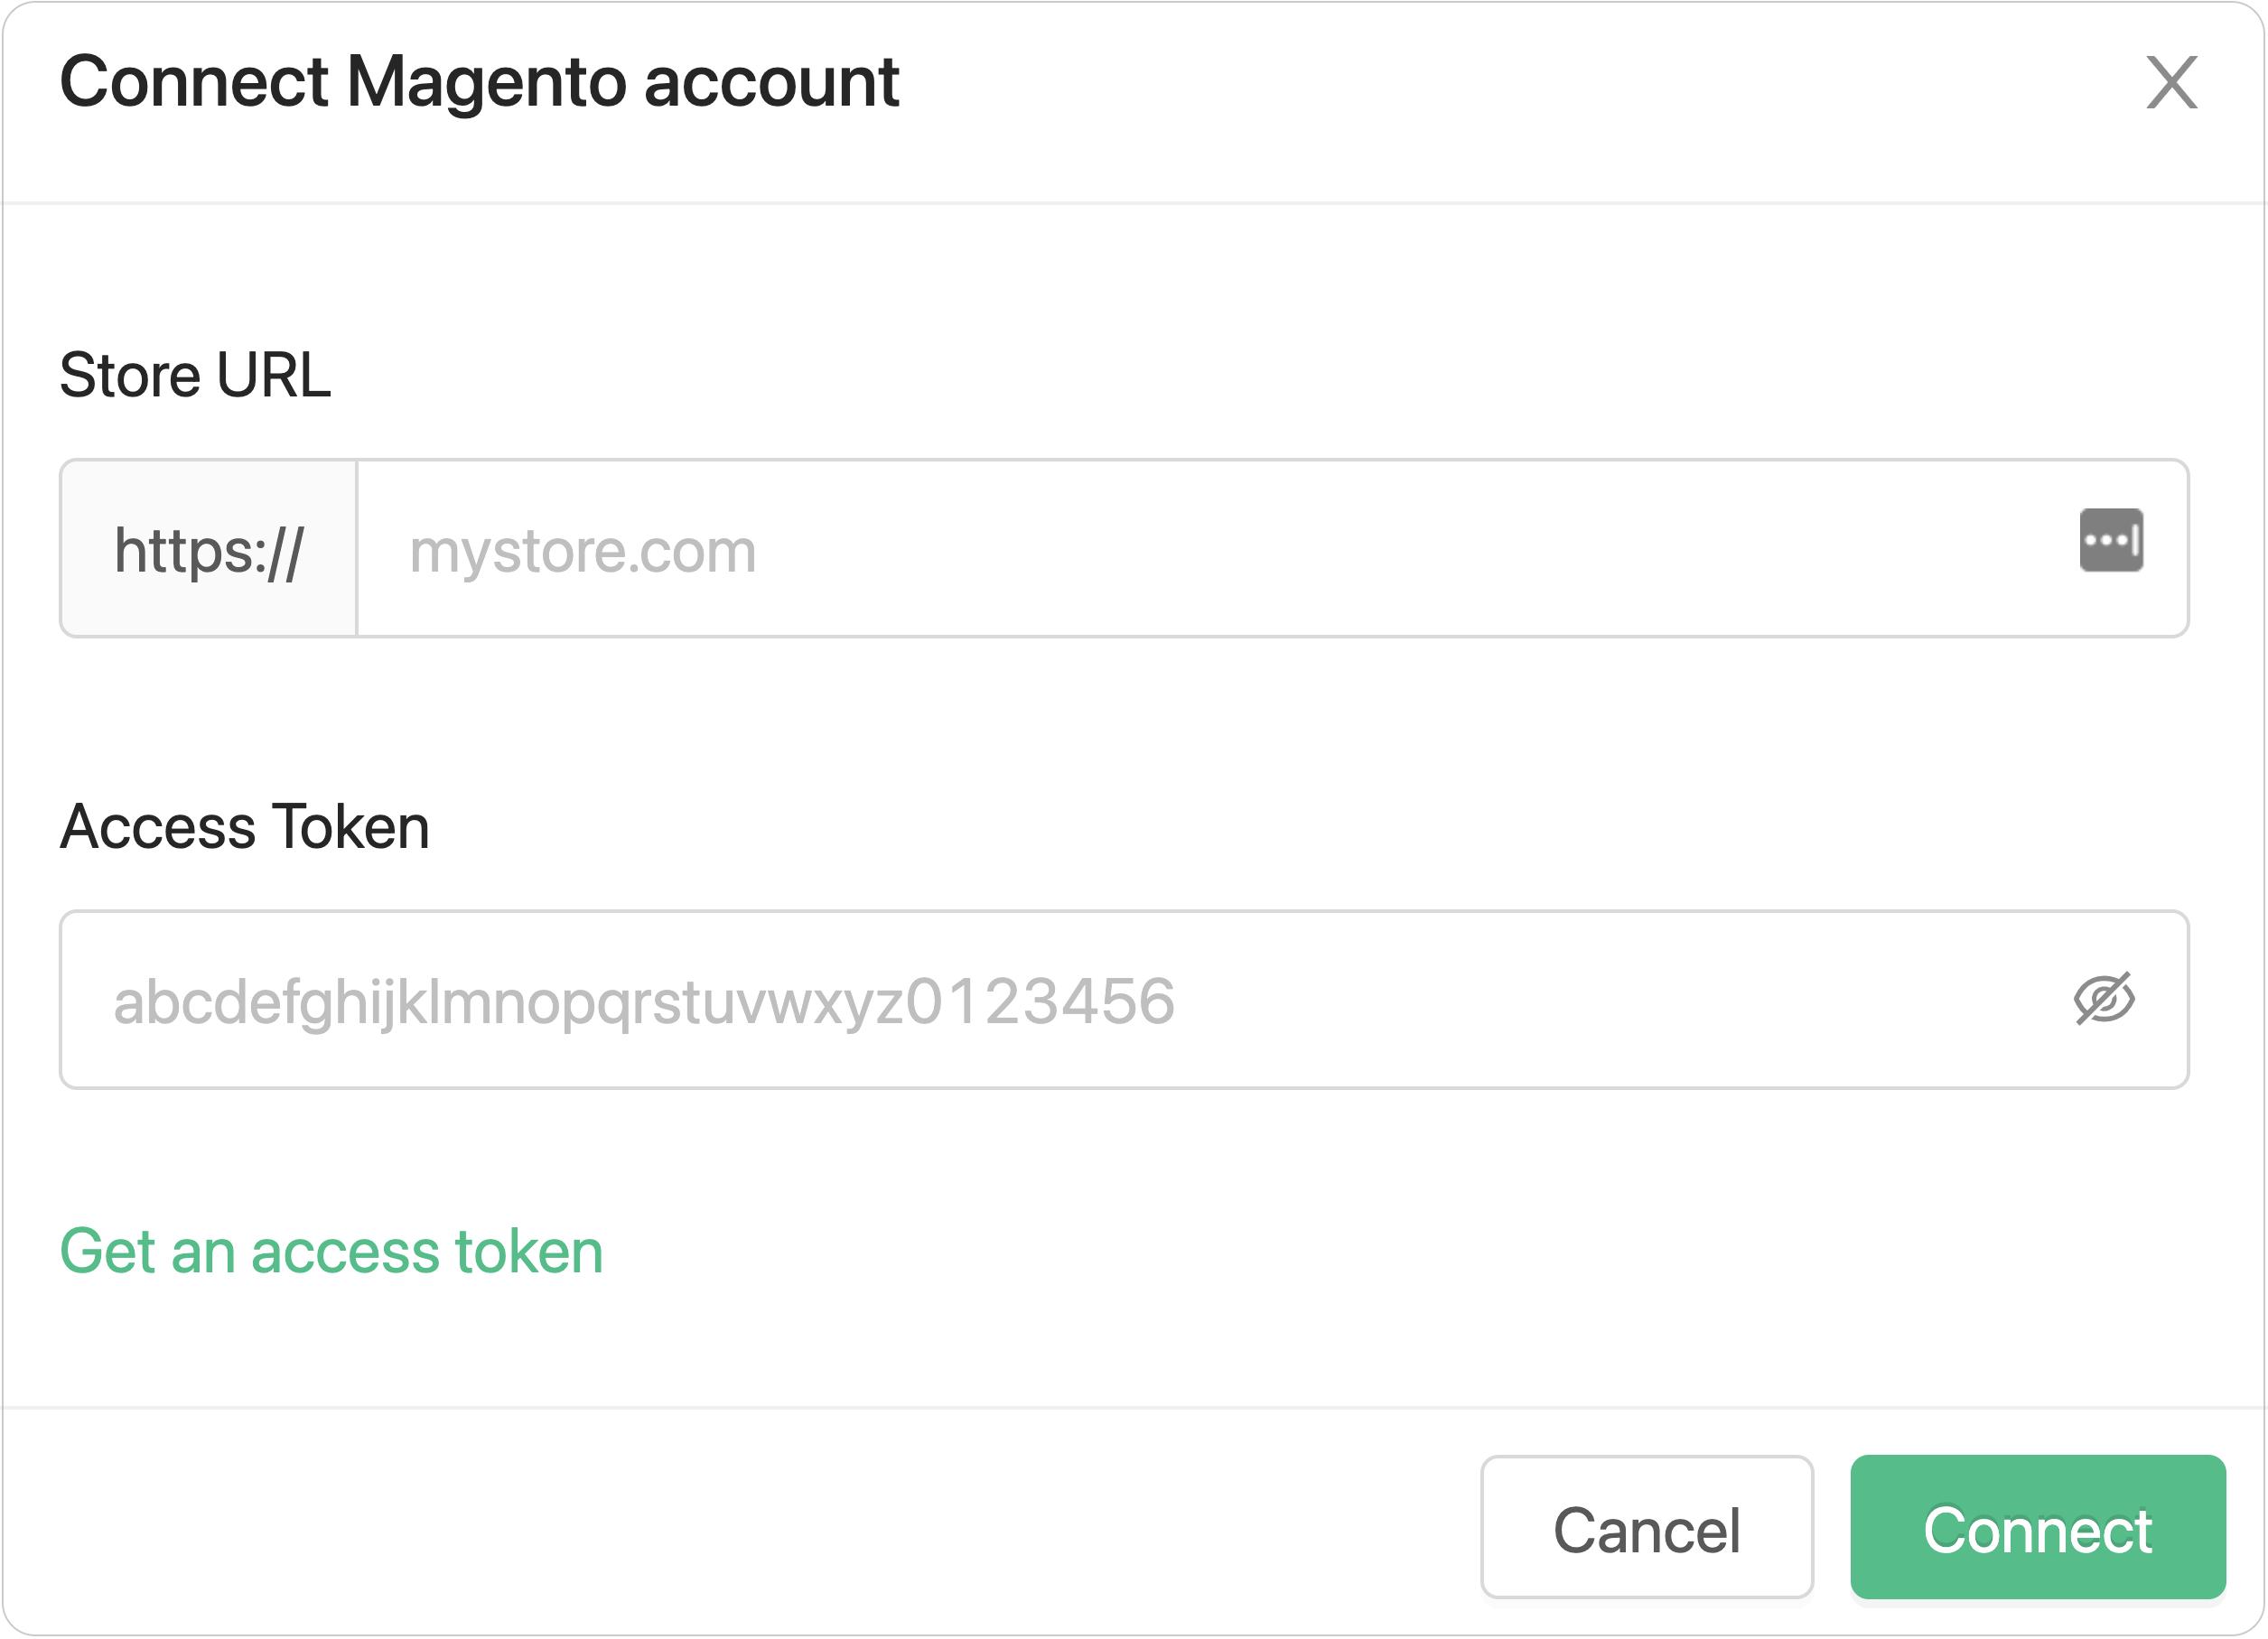 Connect Magento Account to Wayflyer